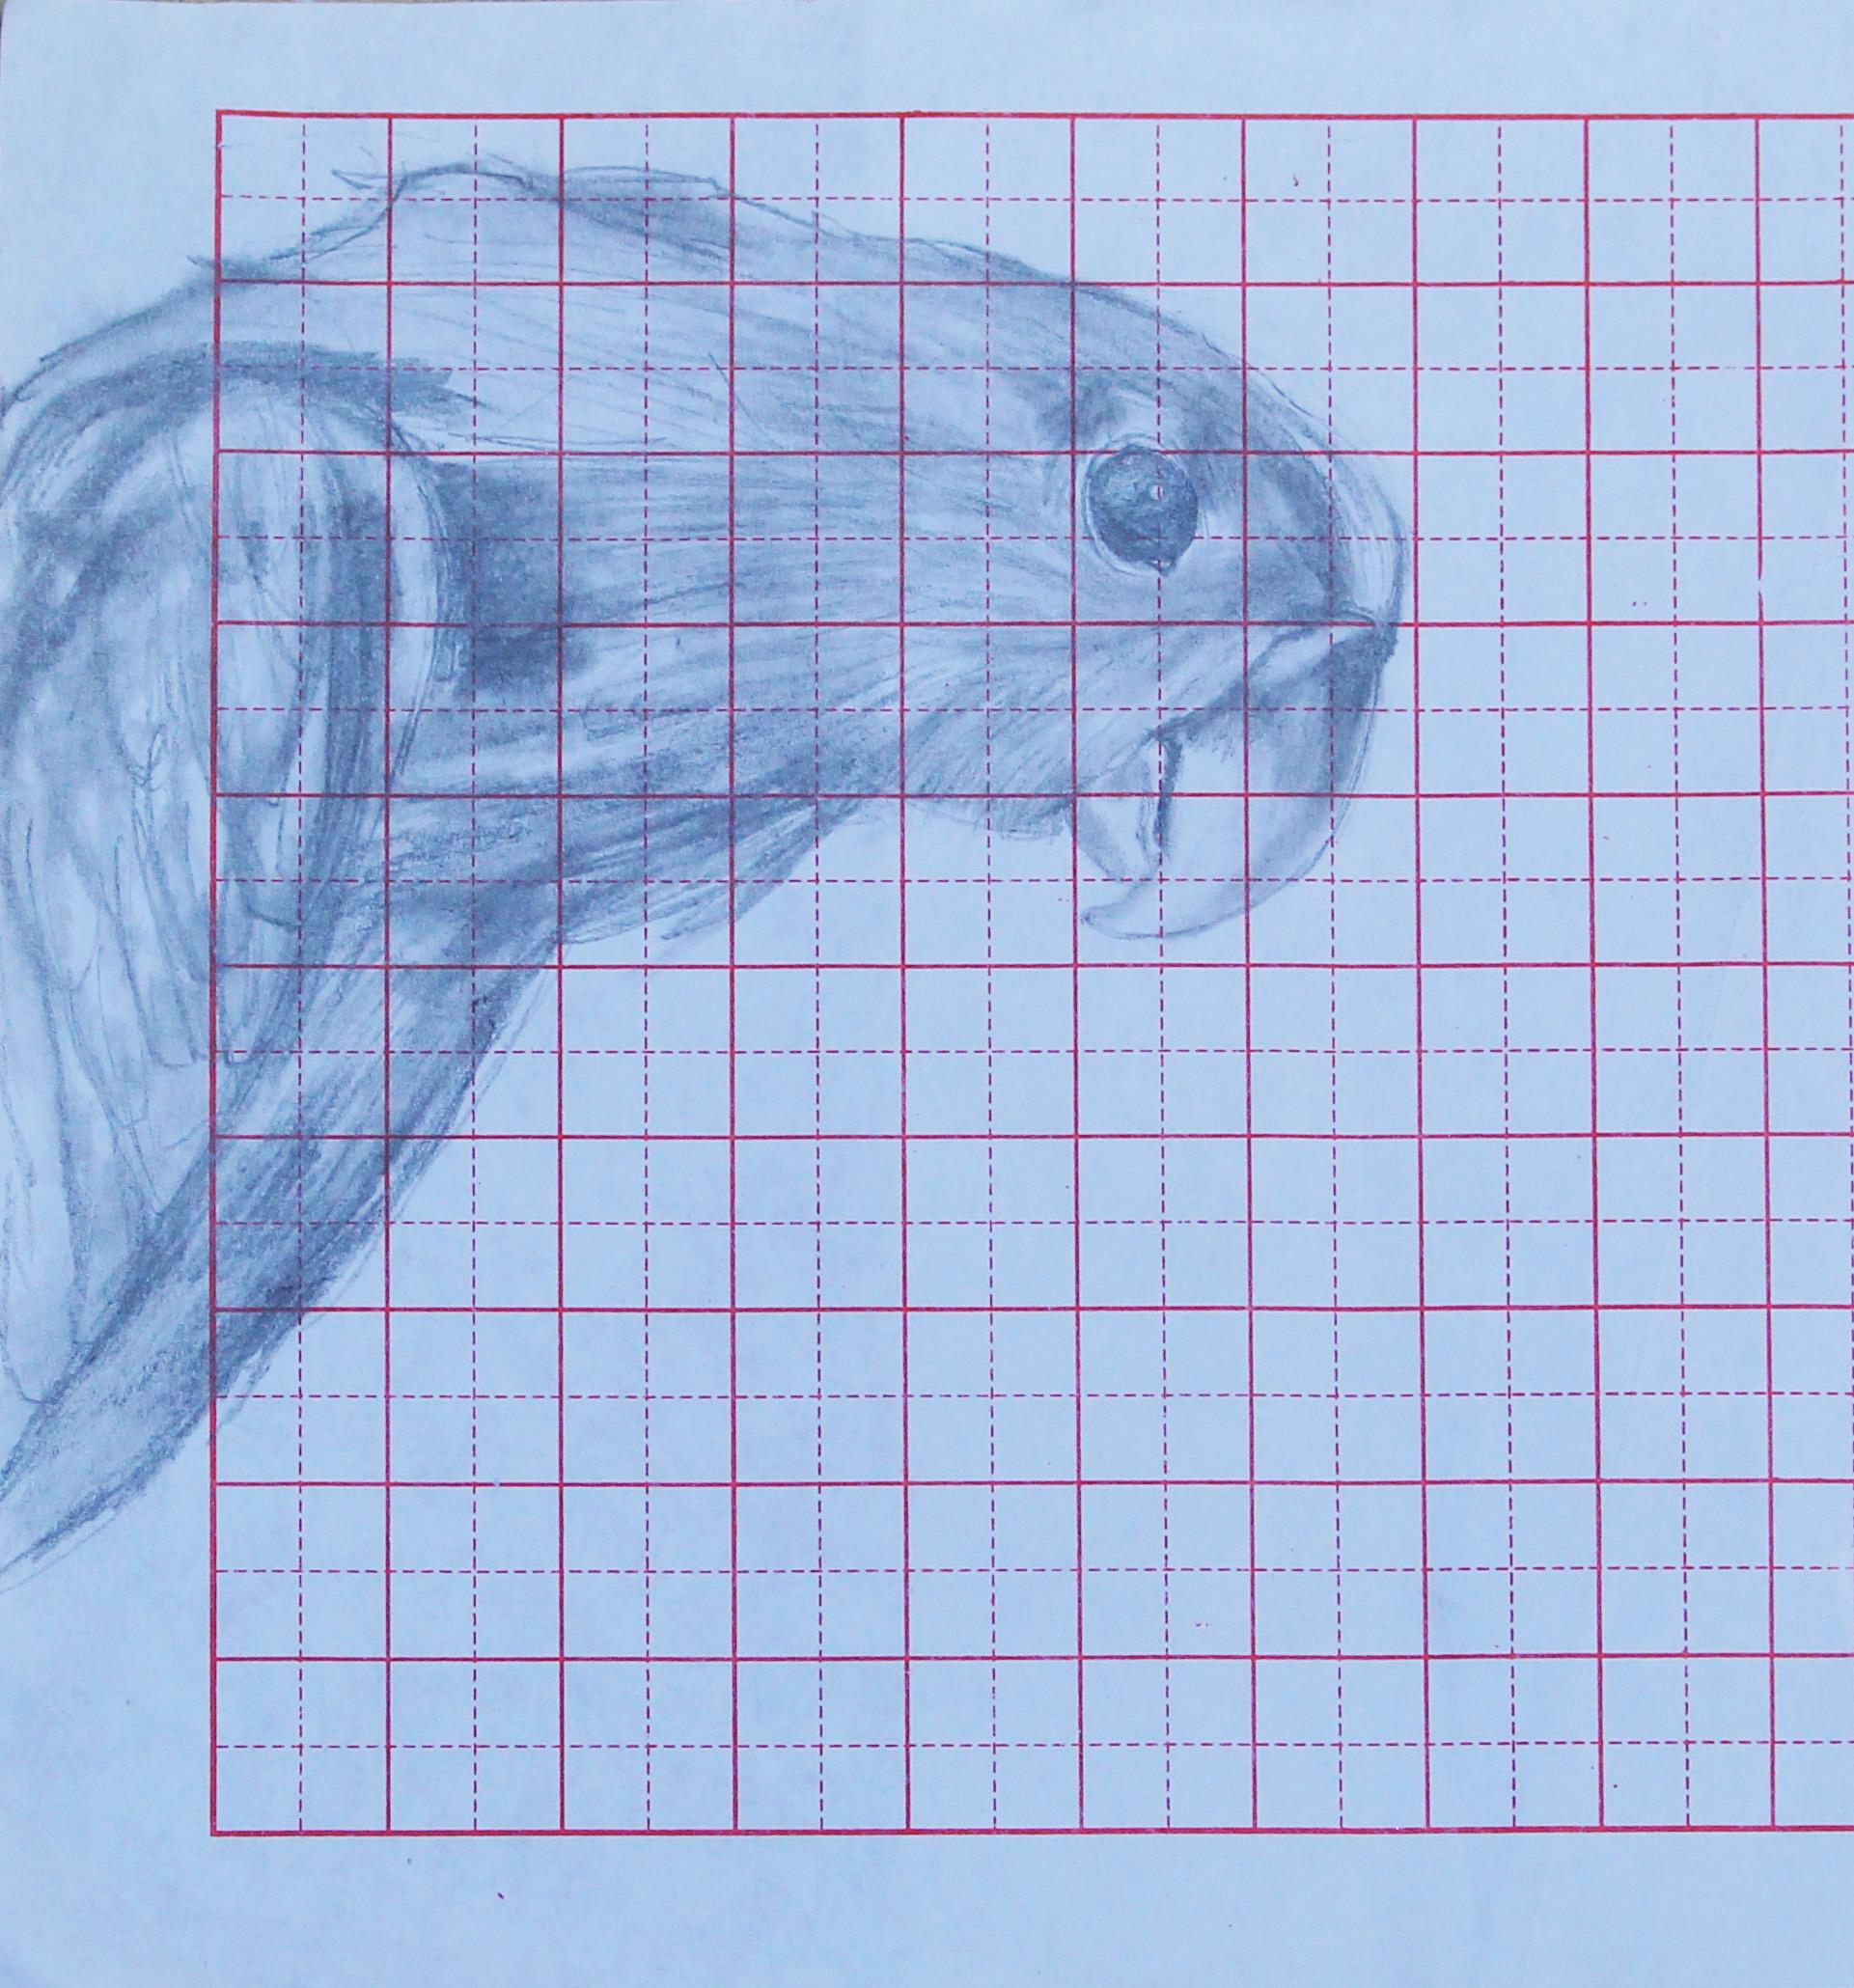 Sketchbook- Parrot // Carnet de croquis - Perroquet